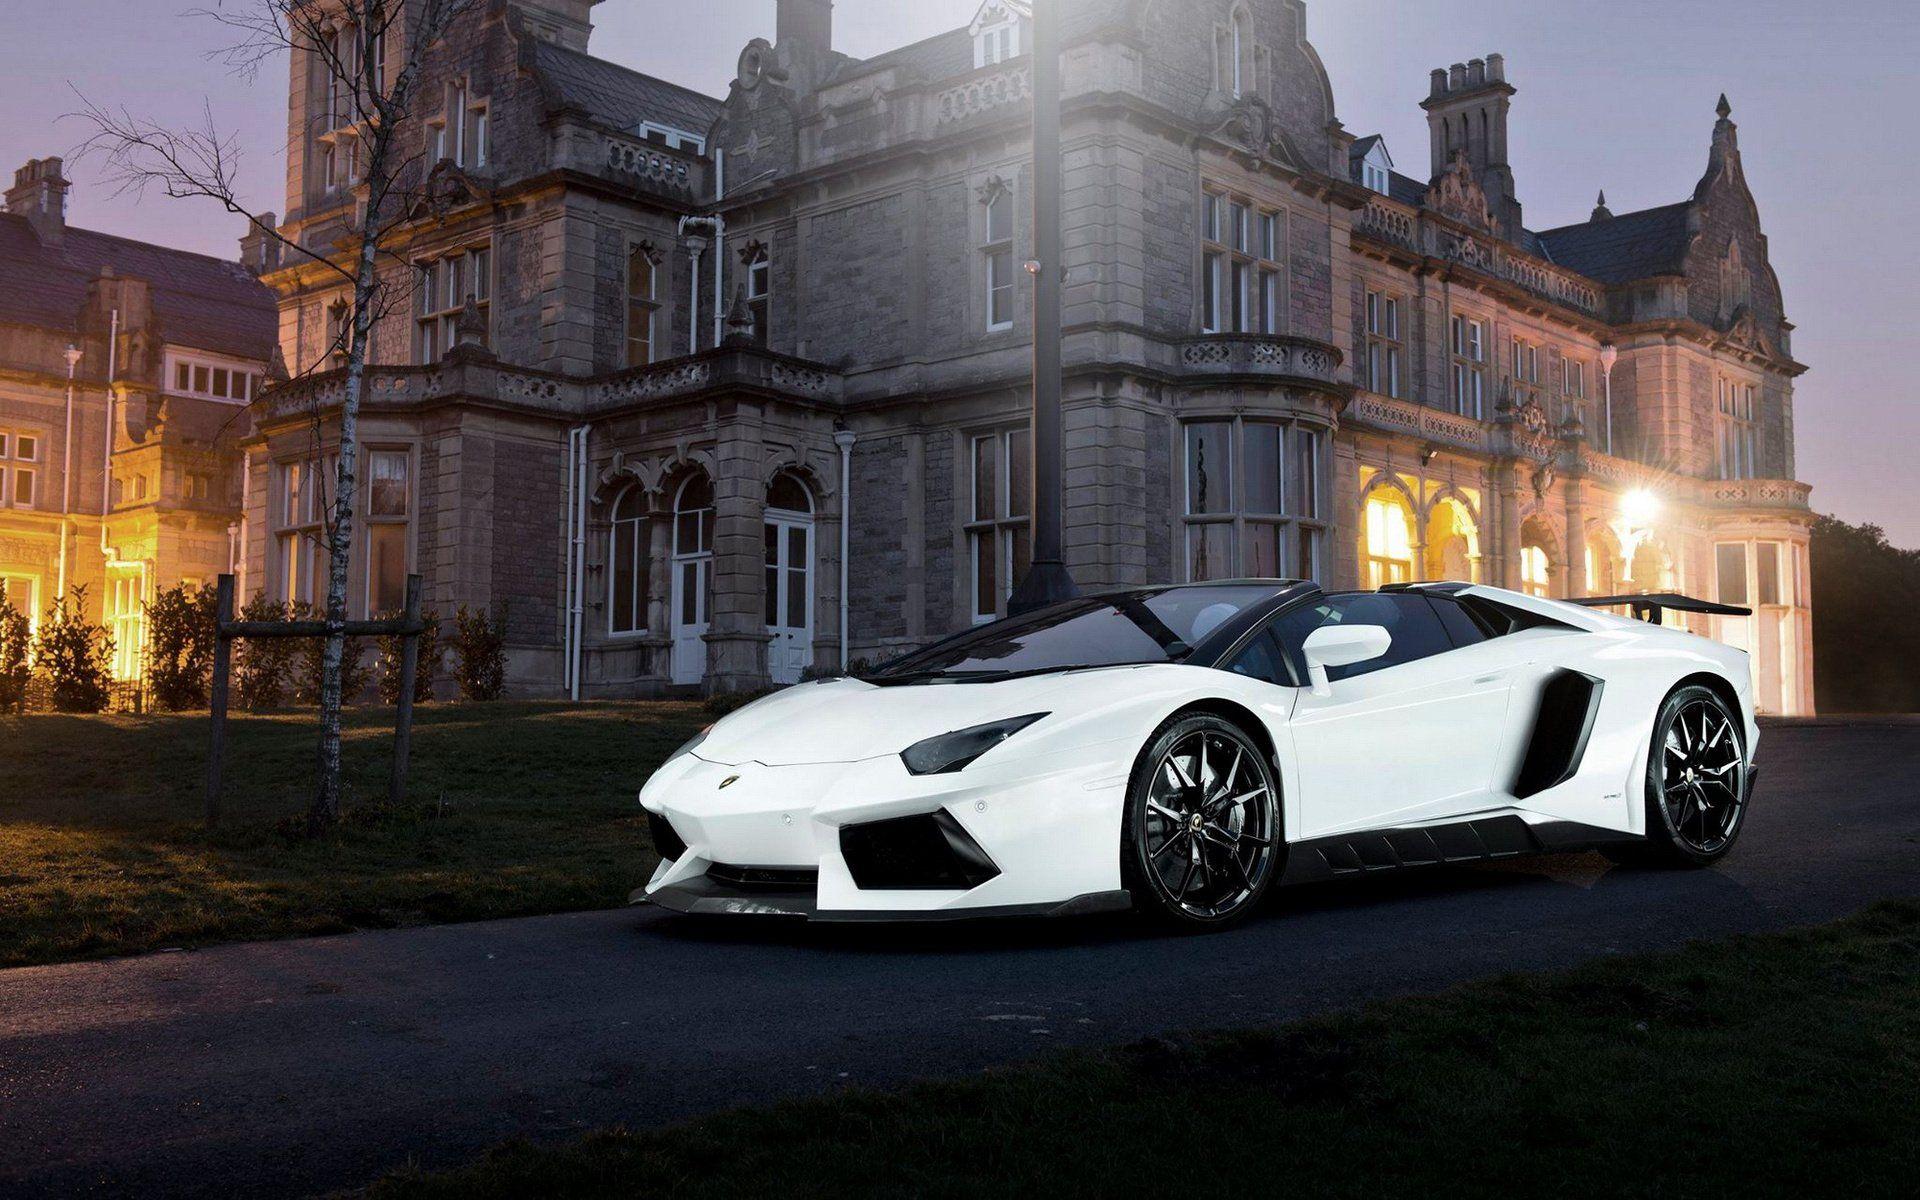 White Lamborghini Aventador LP 700 4 Stands Next To The Castle 1920x1200